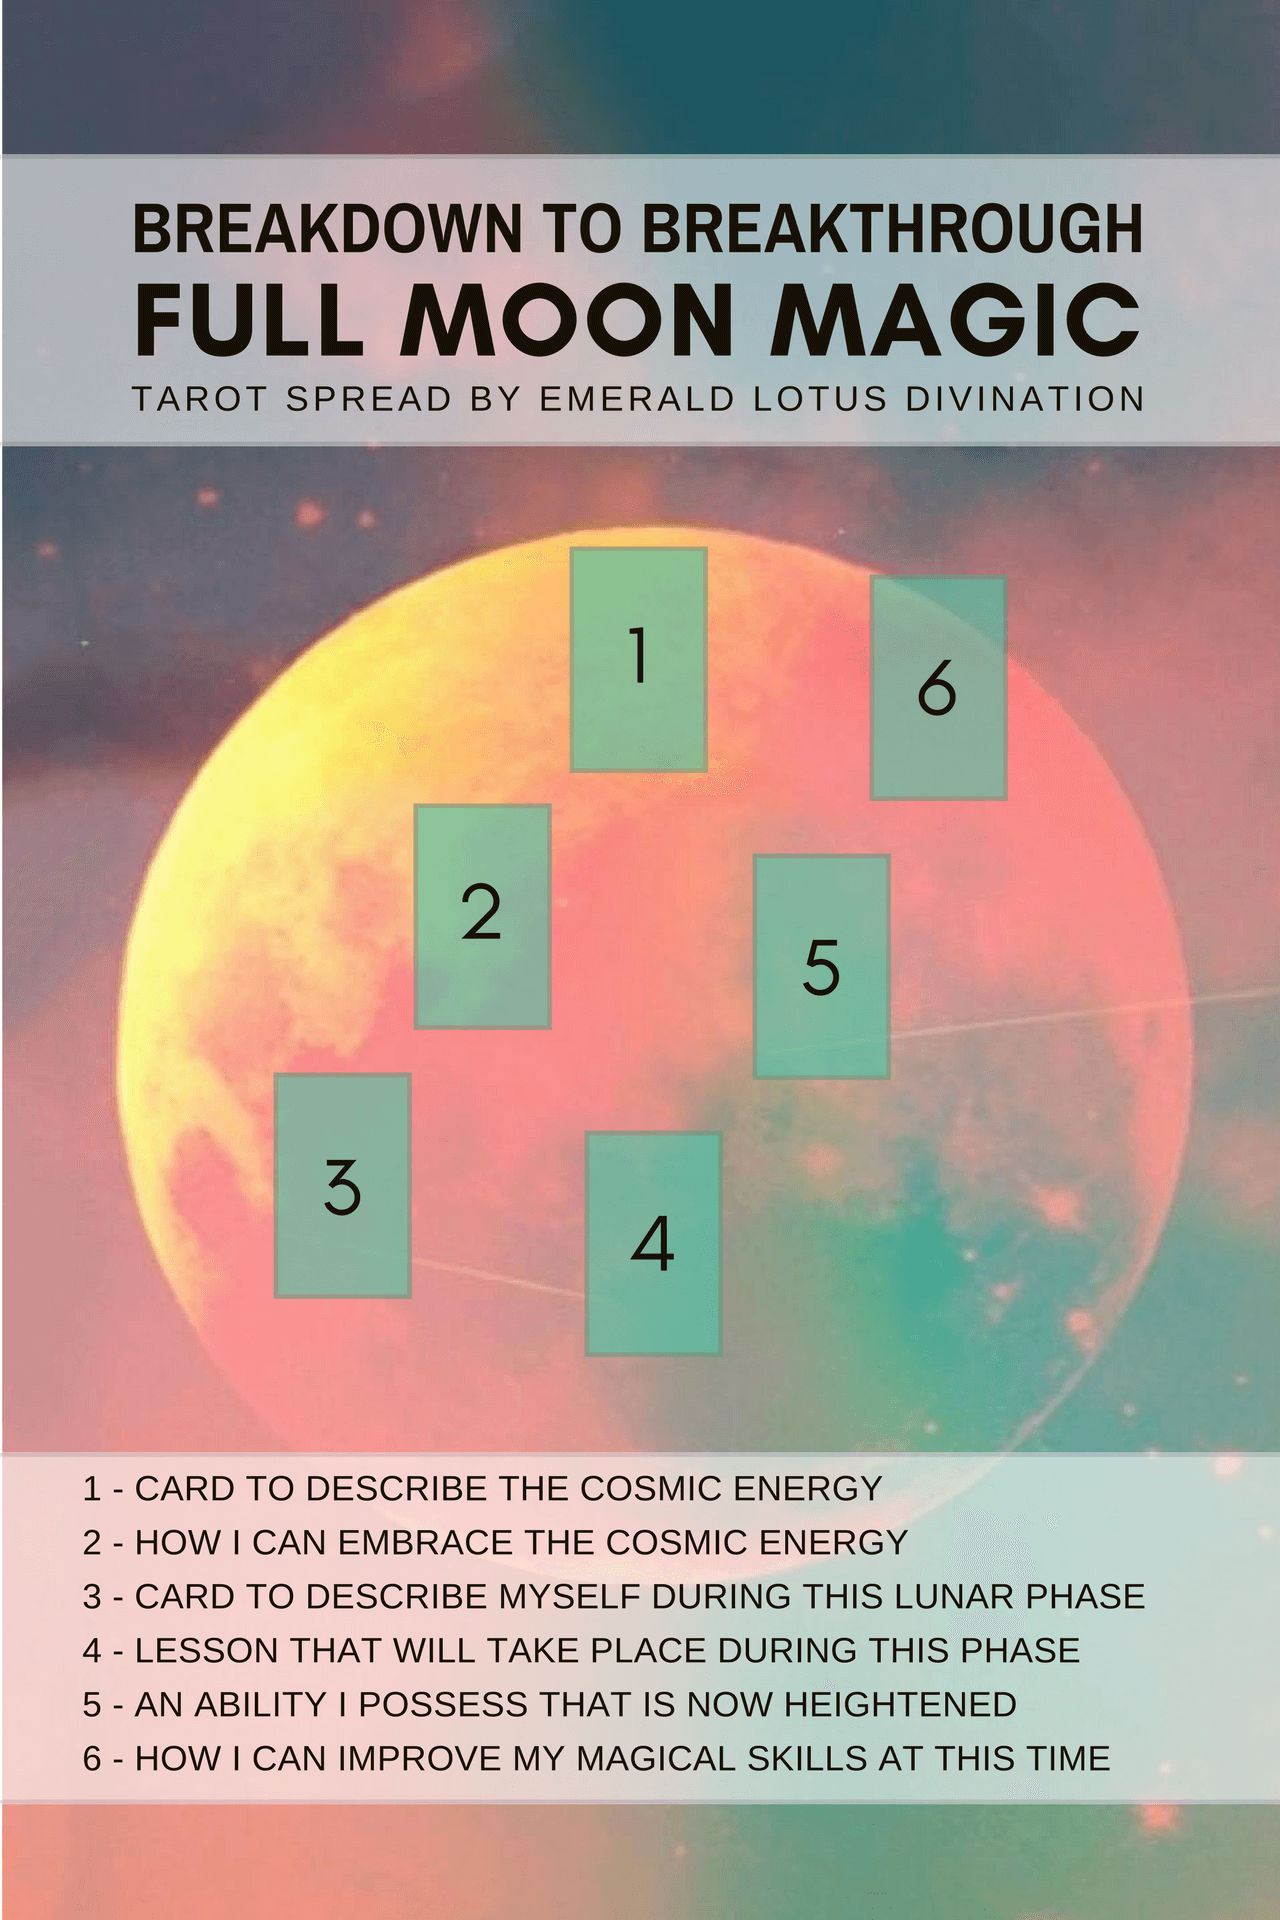 breakdown-to-breakthrough-full-moon-magic-tarot-spread-3-1.png